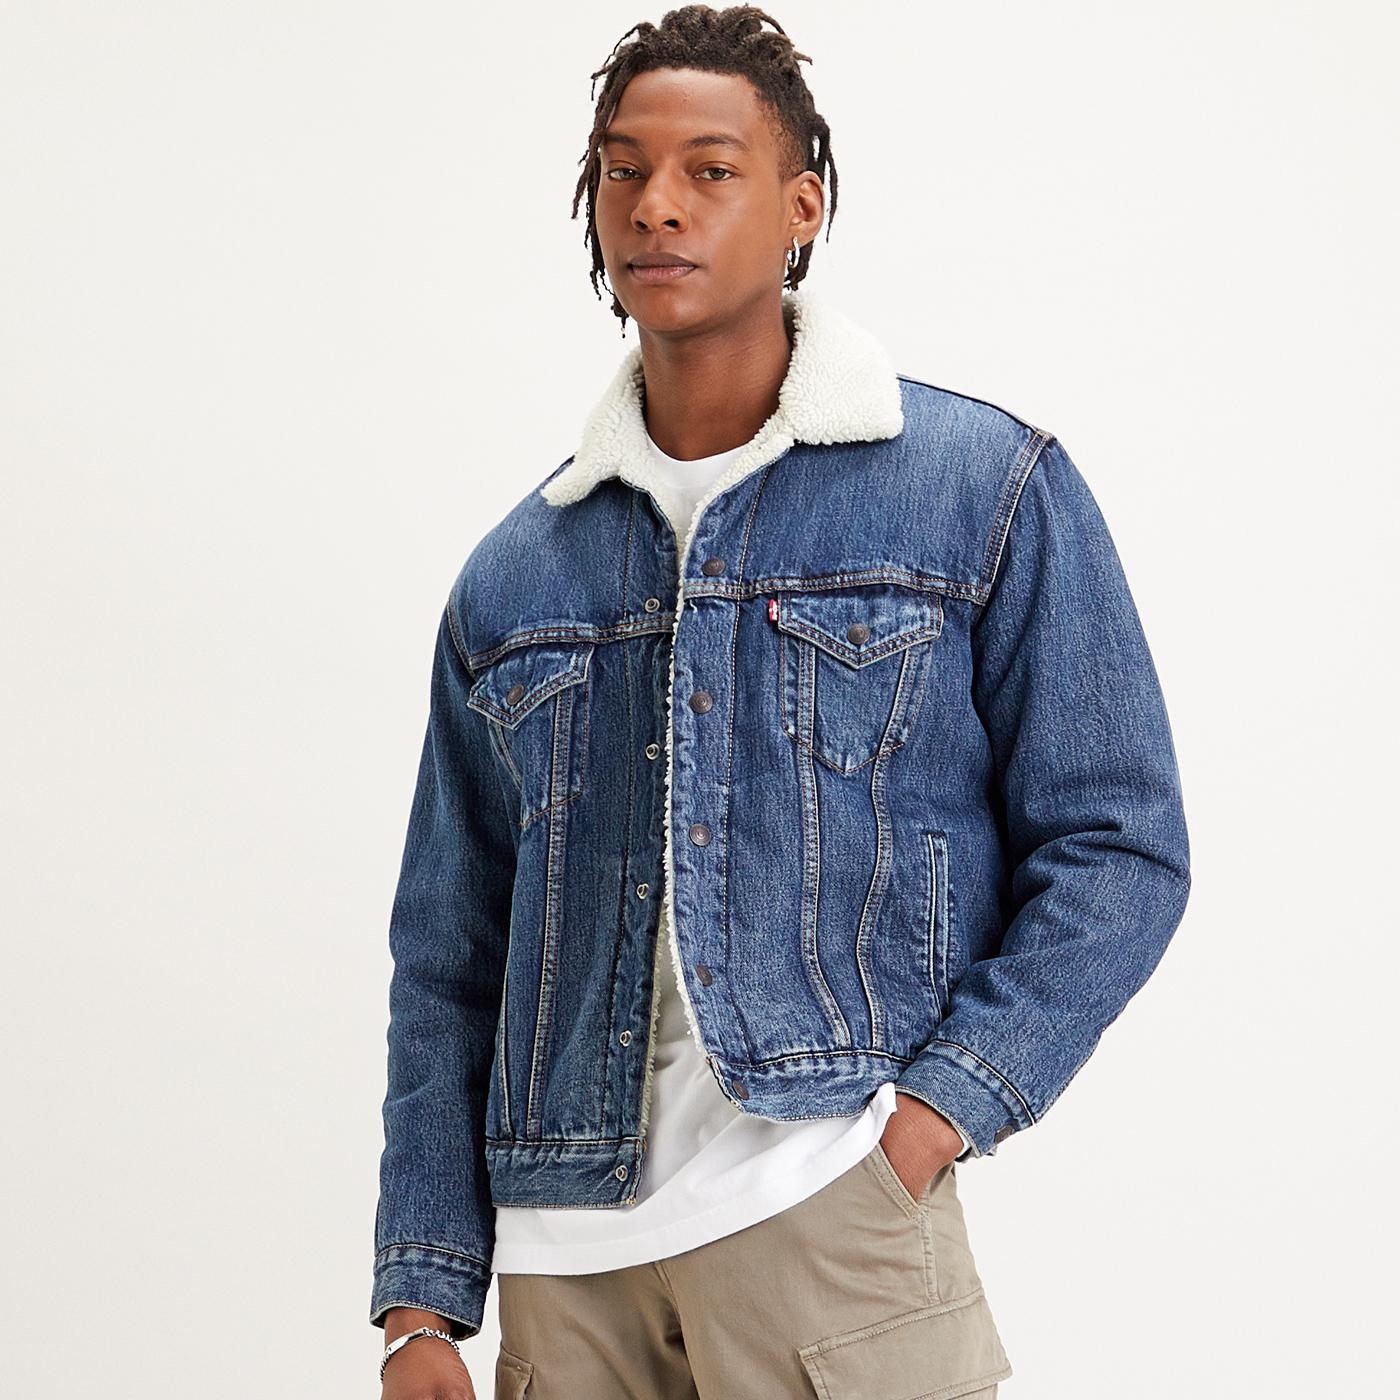 LEVI'S Vintage Fit Denim Sherpa Trucker Jacket DI